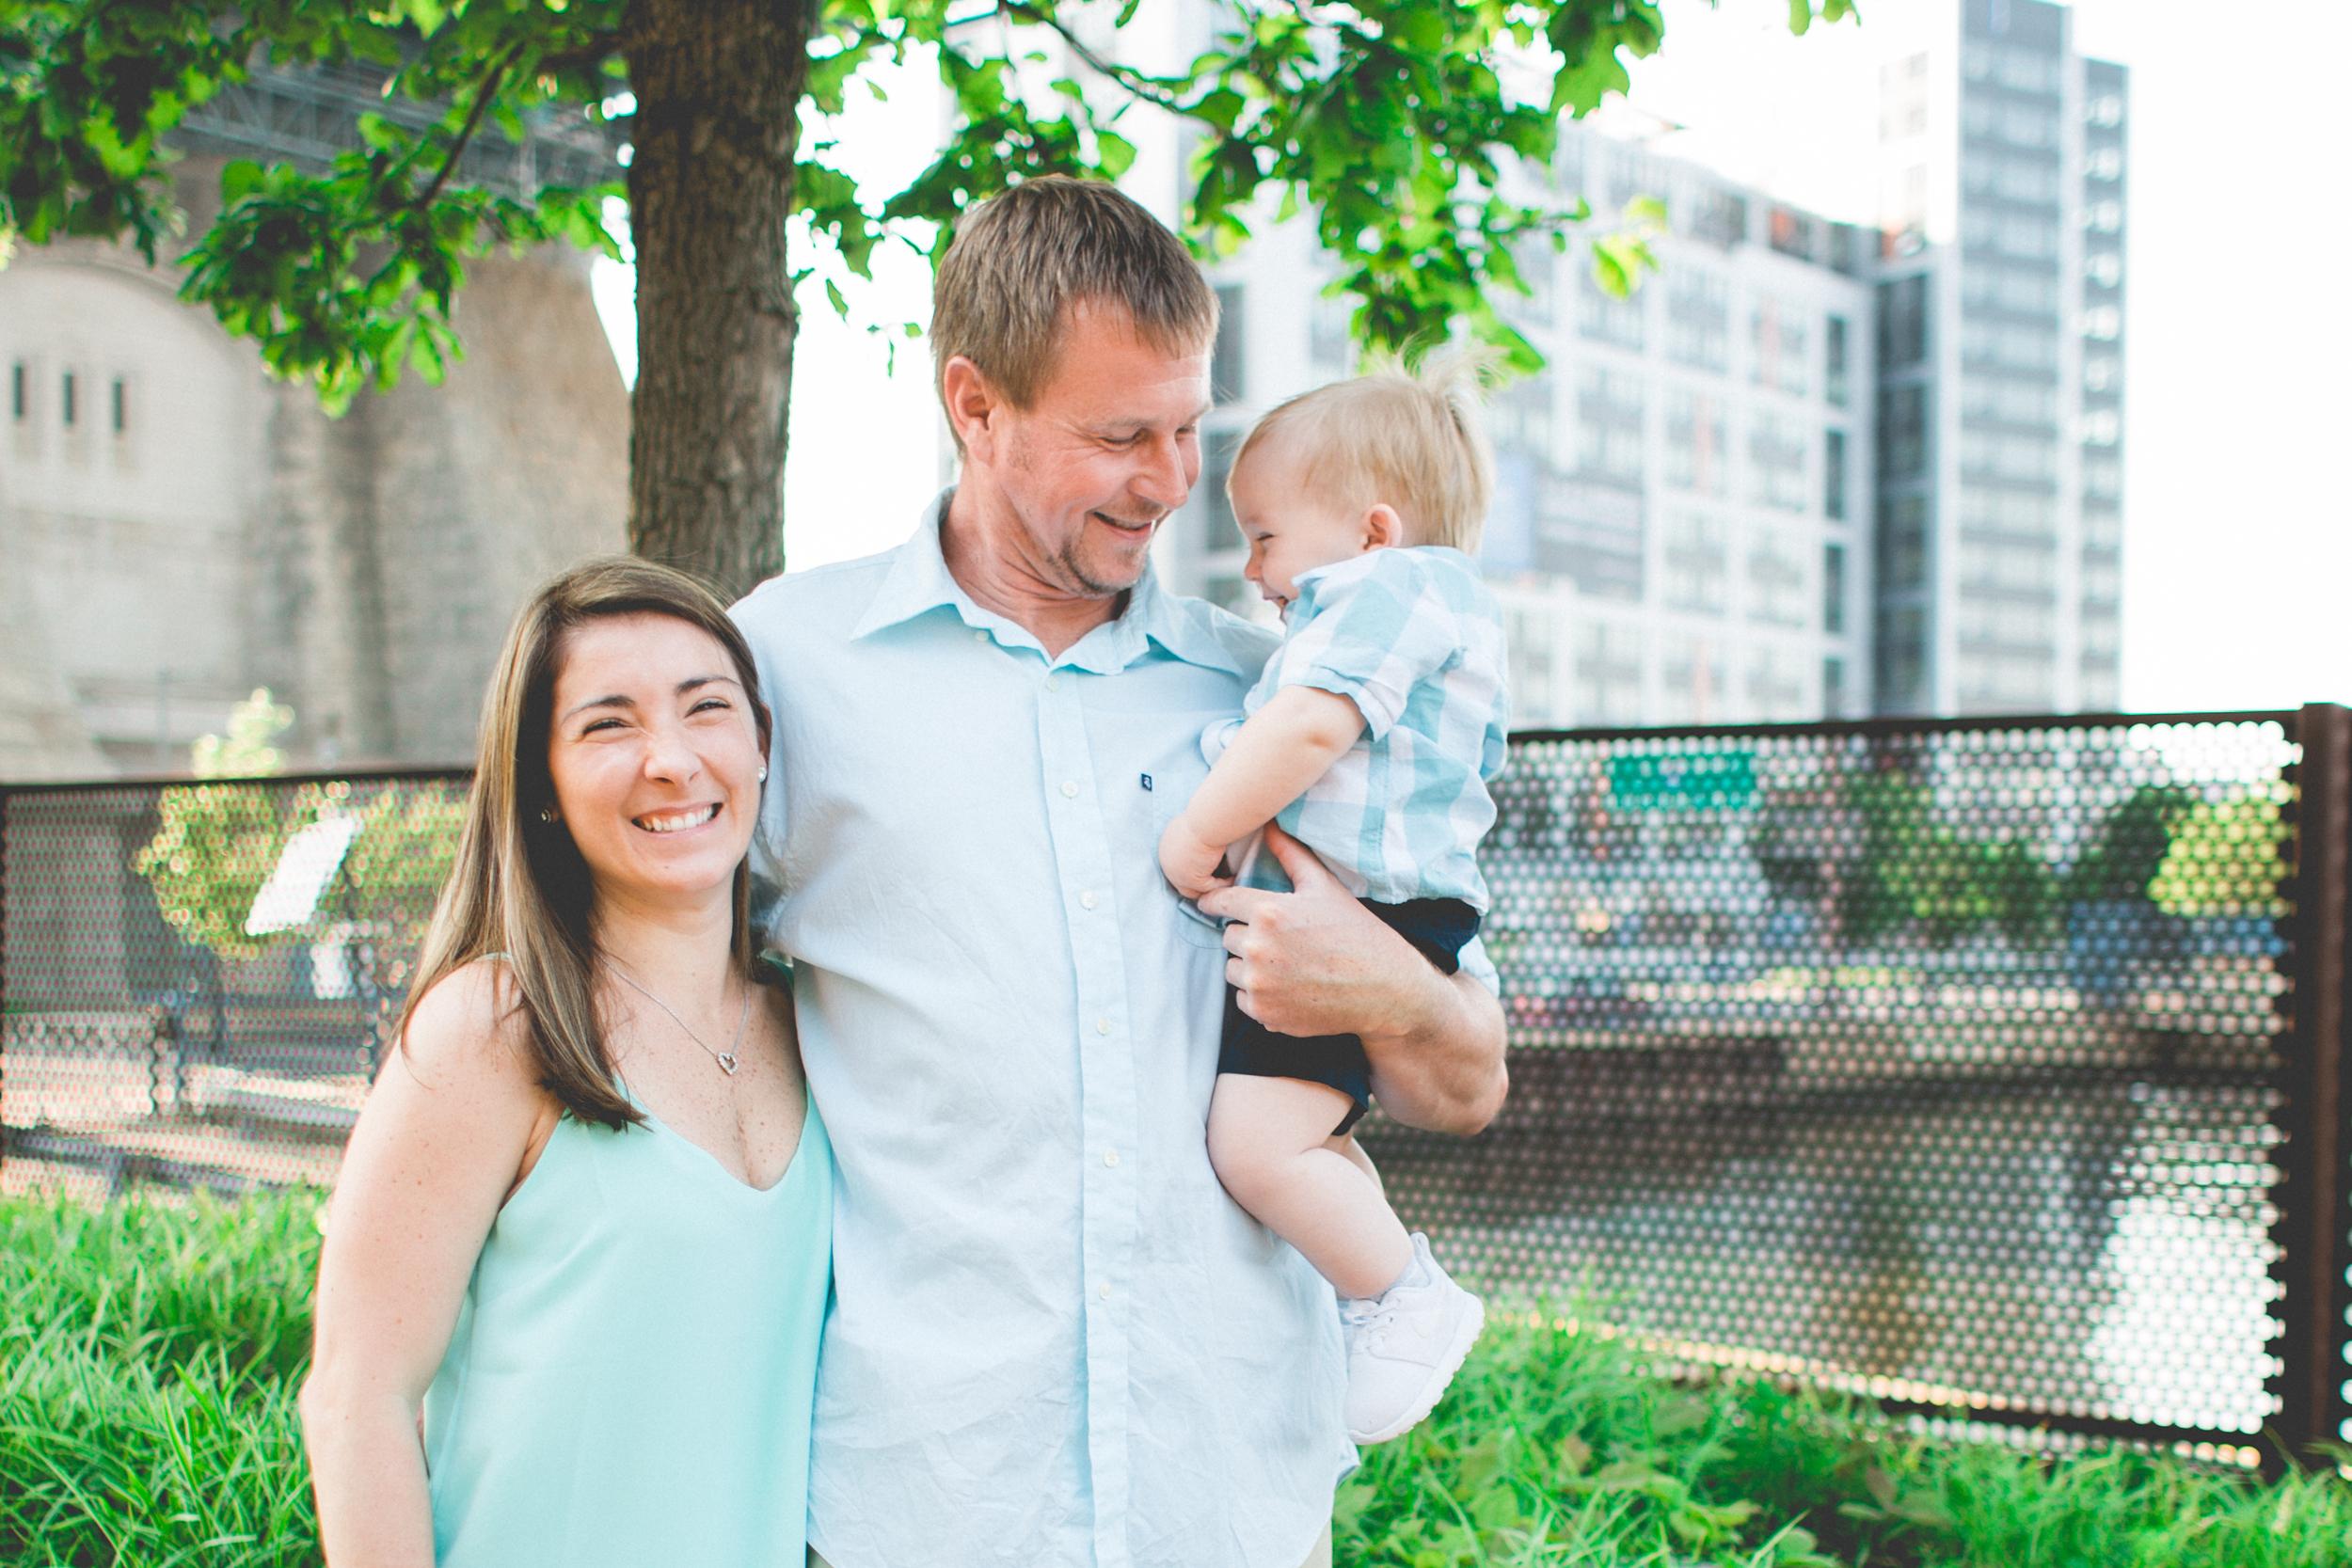 philadelphia, race street pier, baby photoshoot, family photoshoot, philadelphia, PA, fathers day present